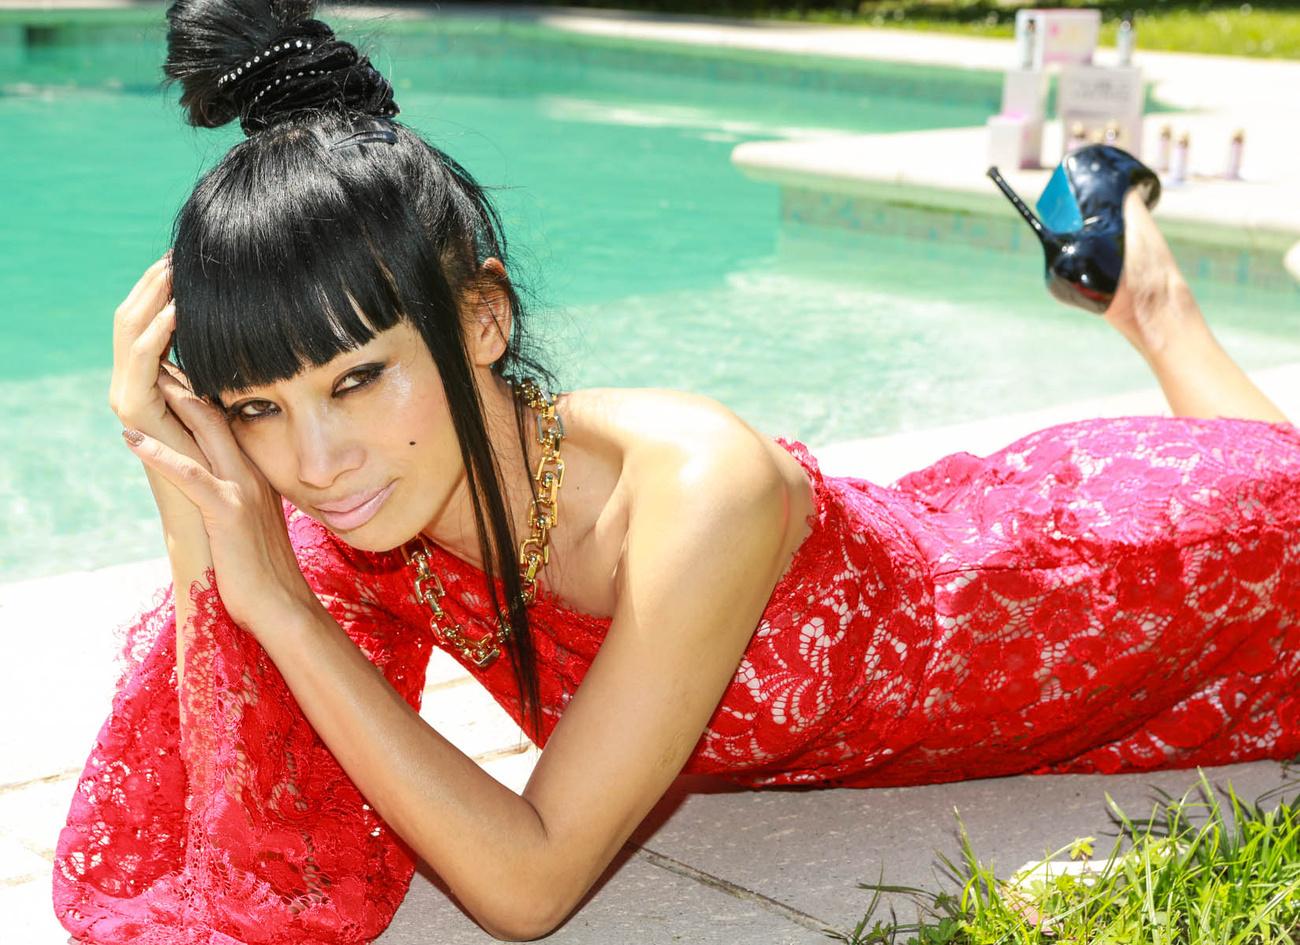 Bai Ling a Bűn érintése című film premierjén Cannes-ban